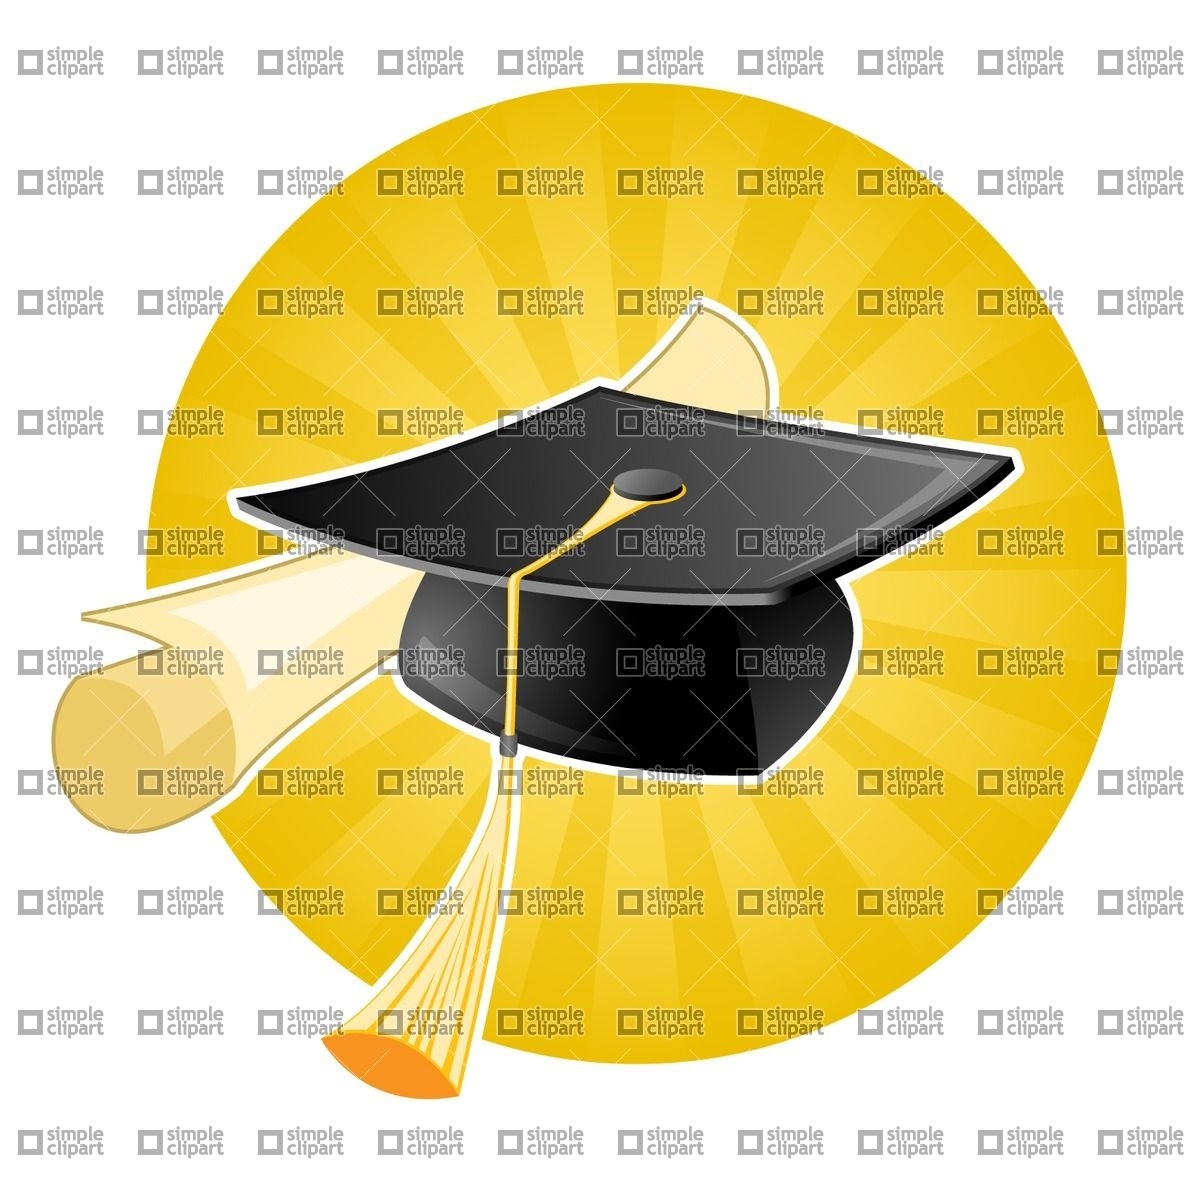 Graduation cap / Mortarboard and diploma Vector Image #1767.